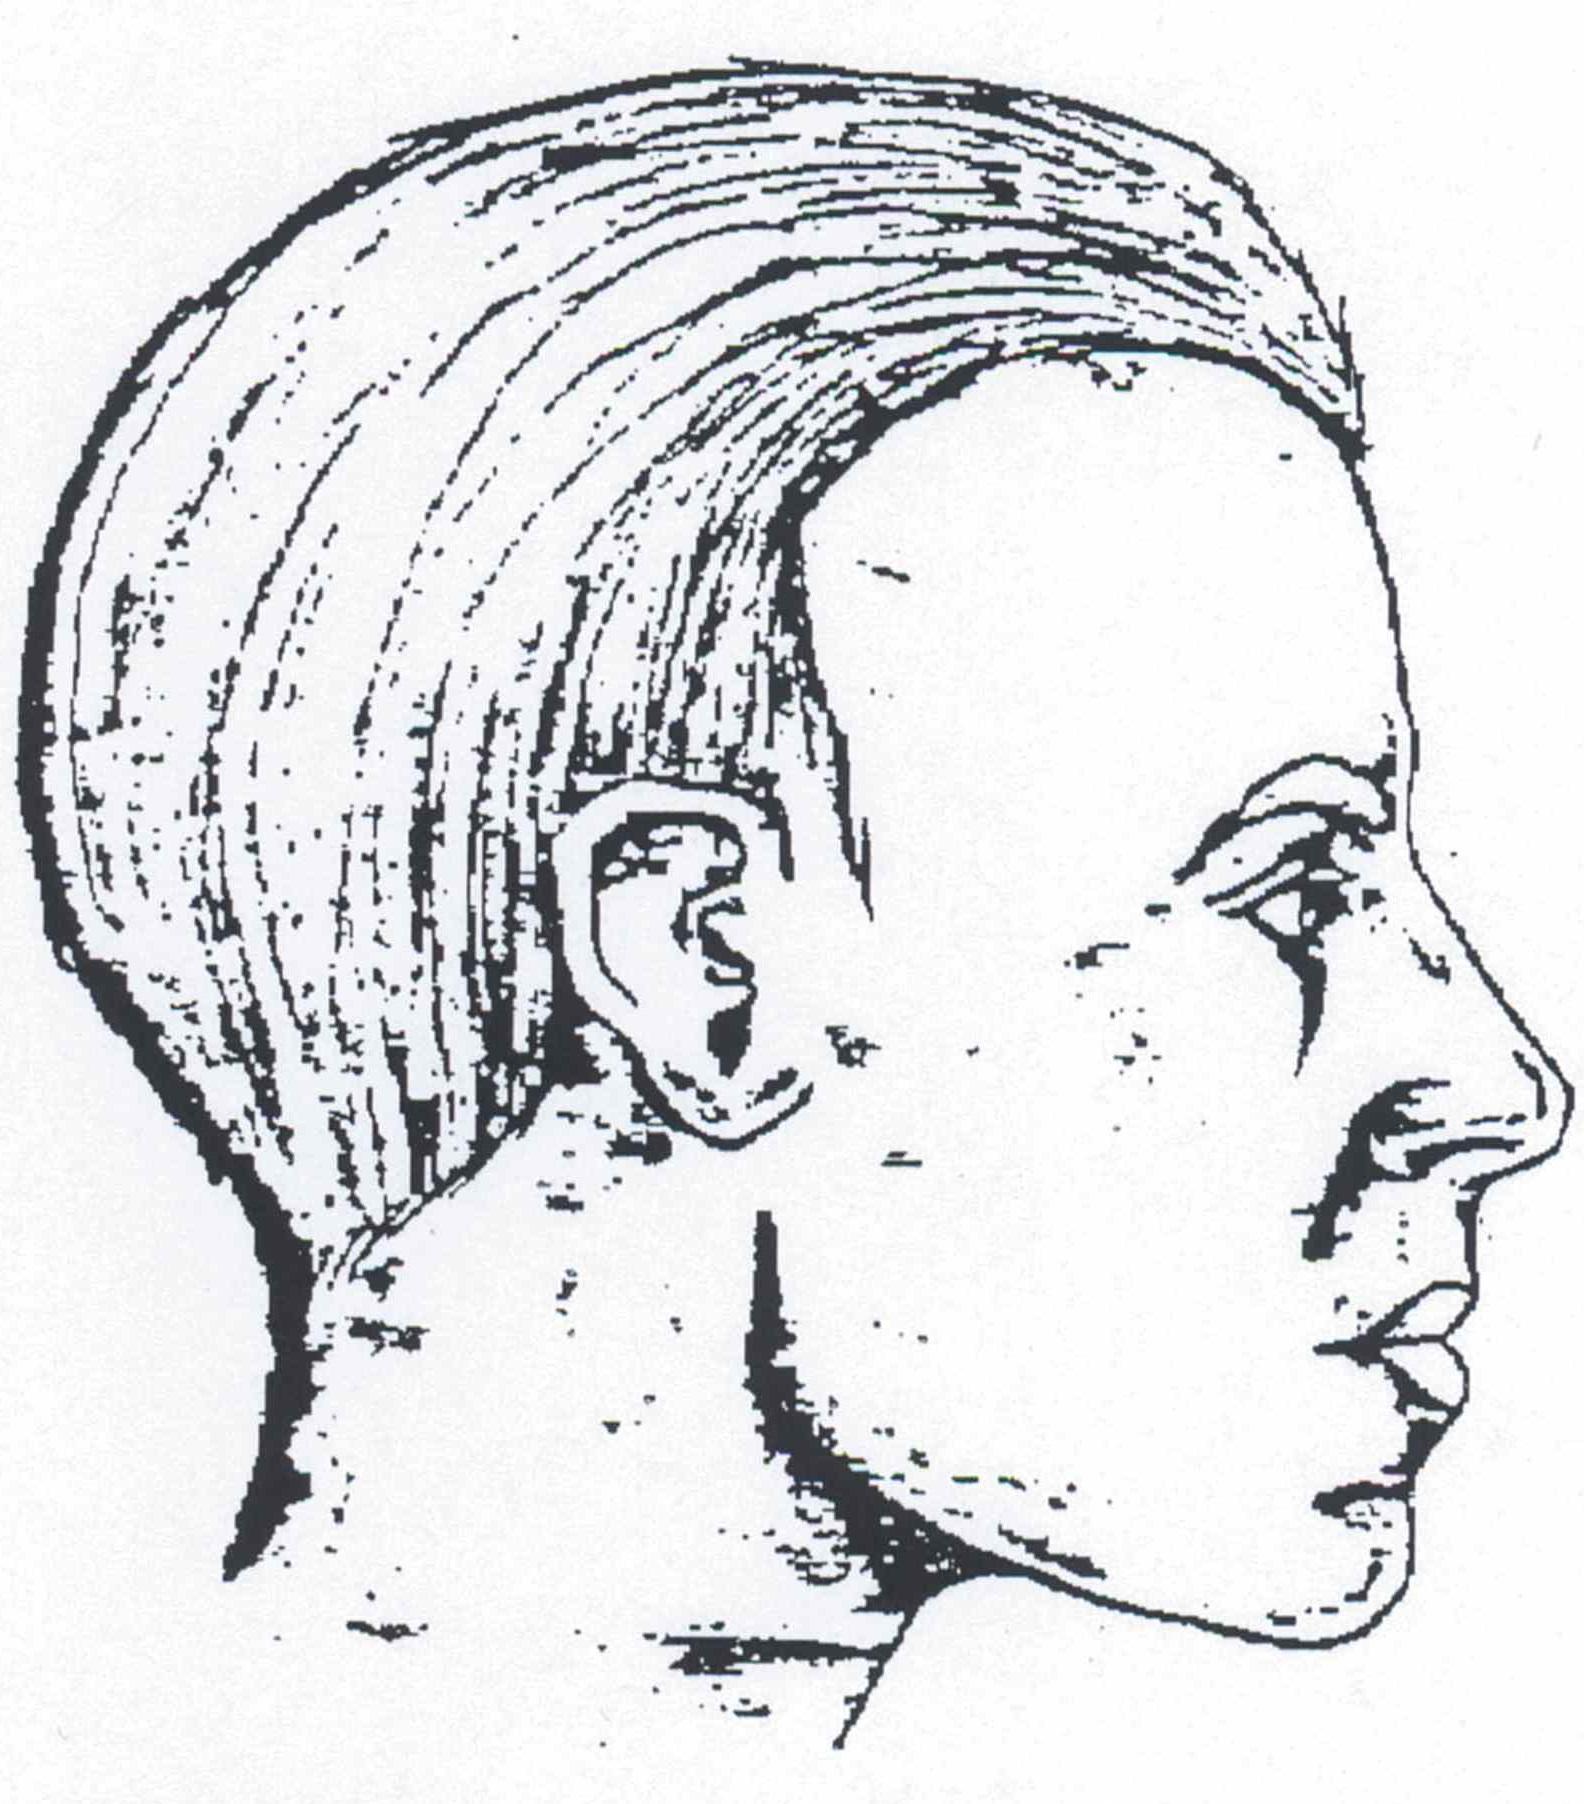 Malibu John Doe (1977)